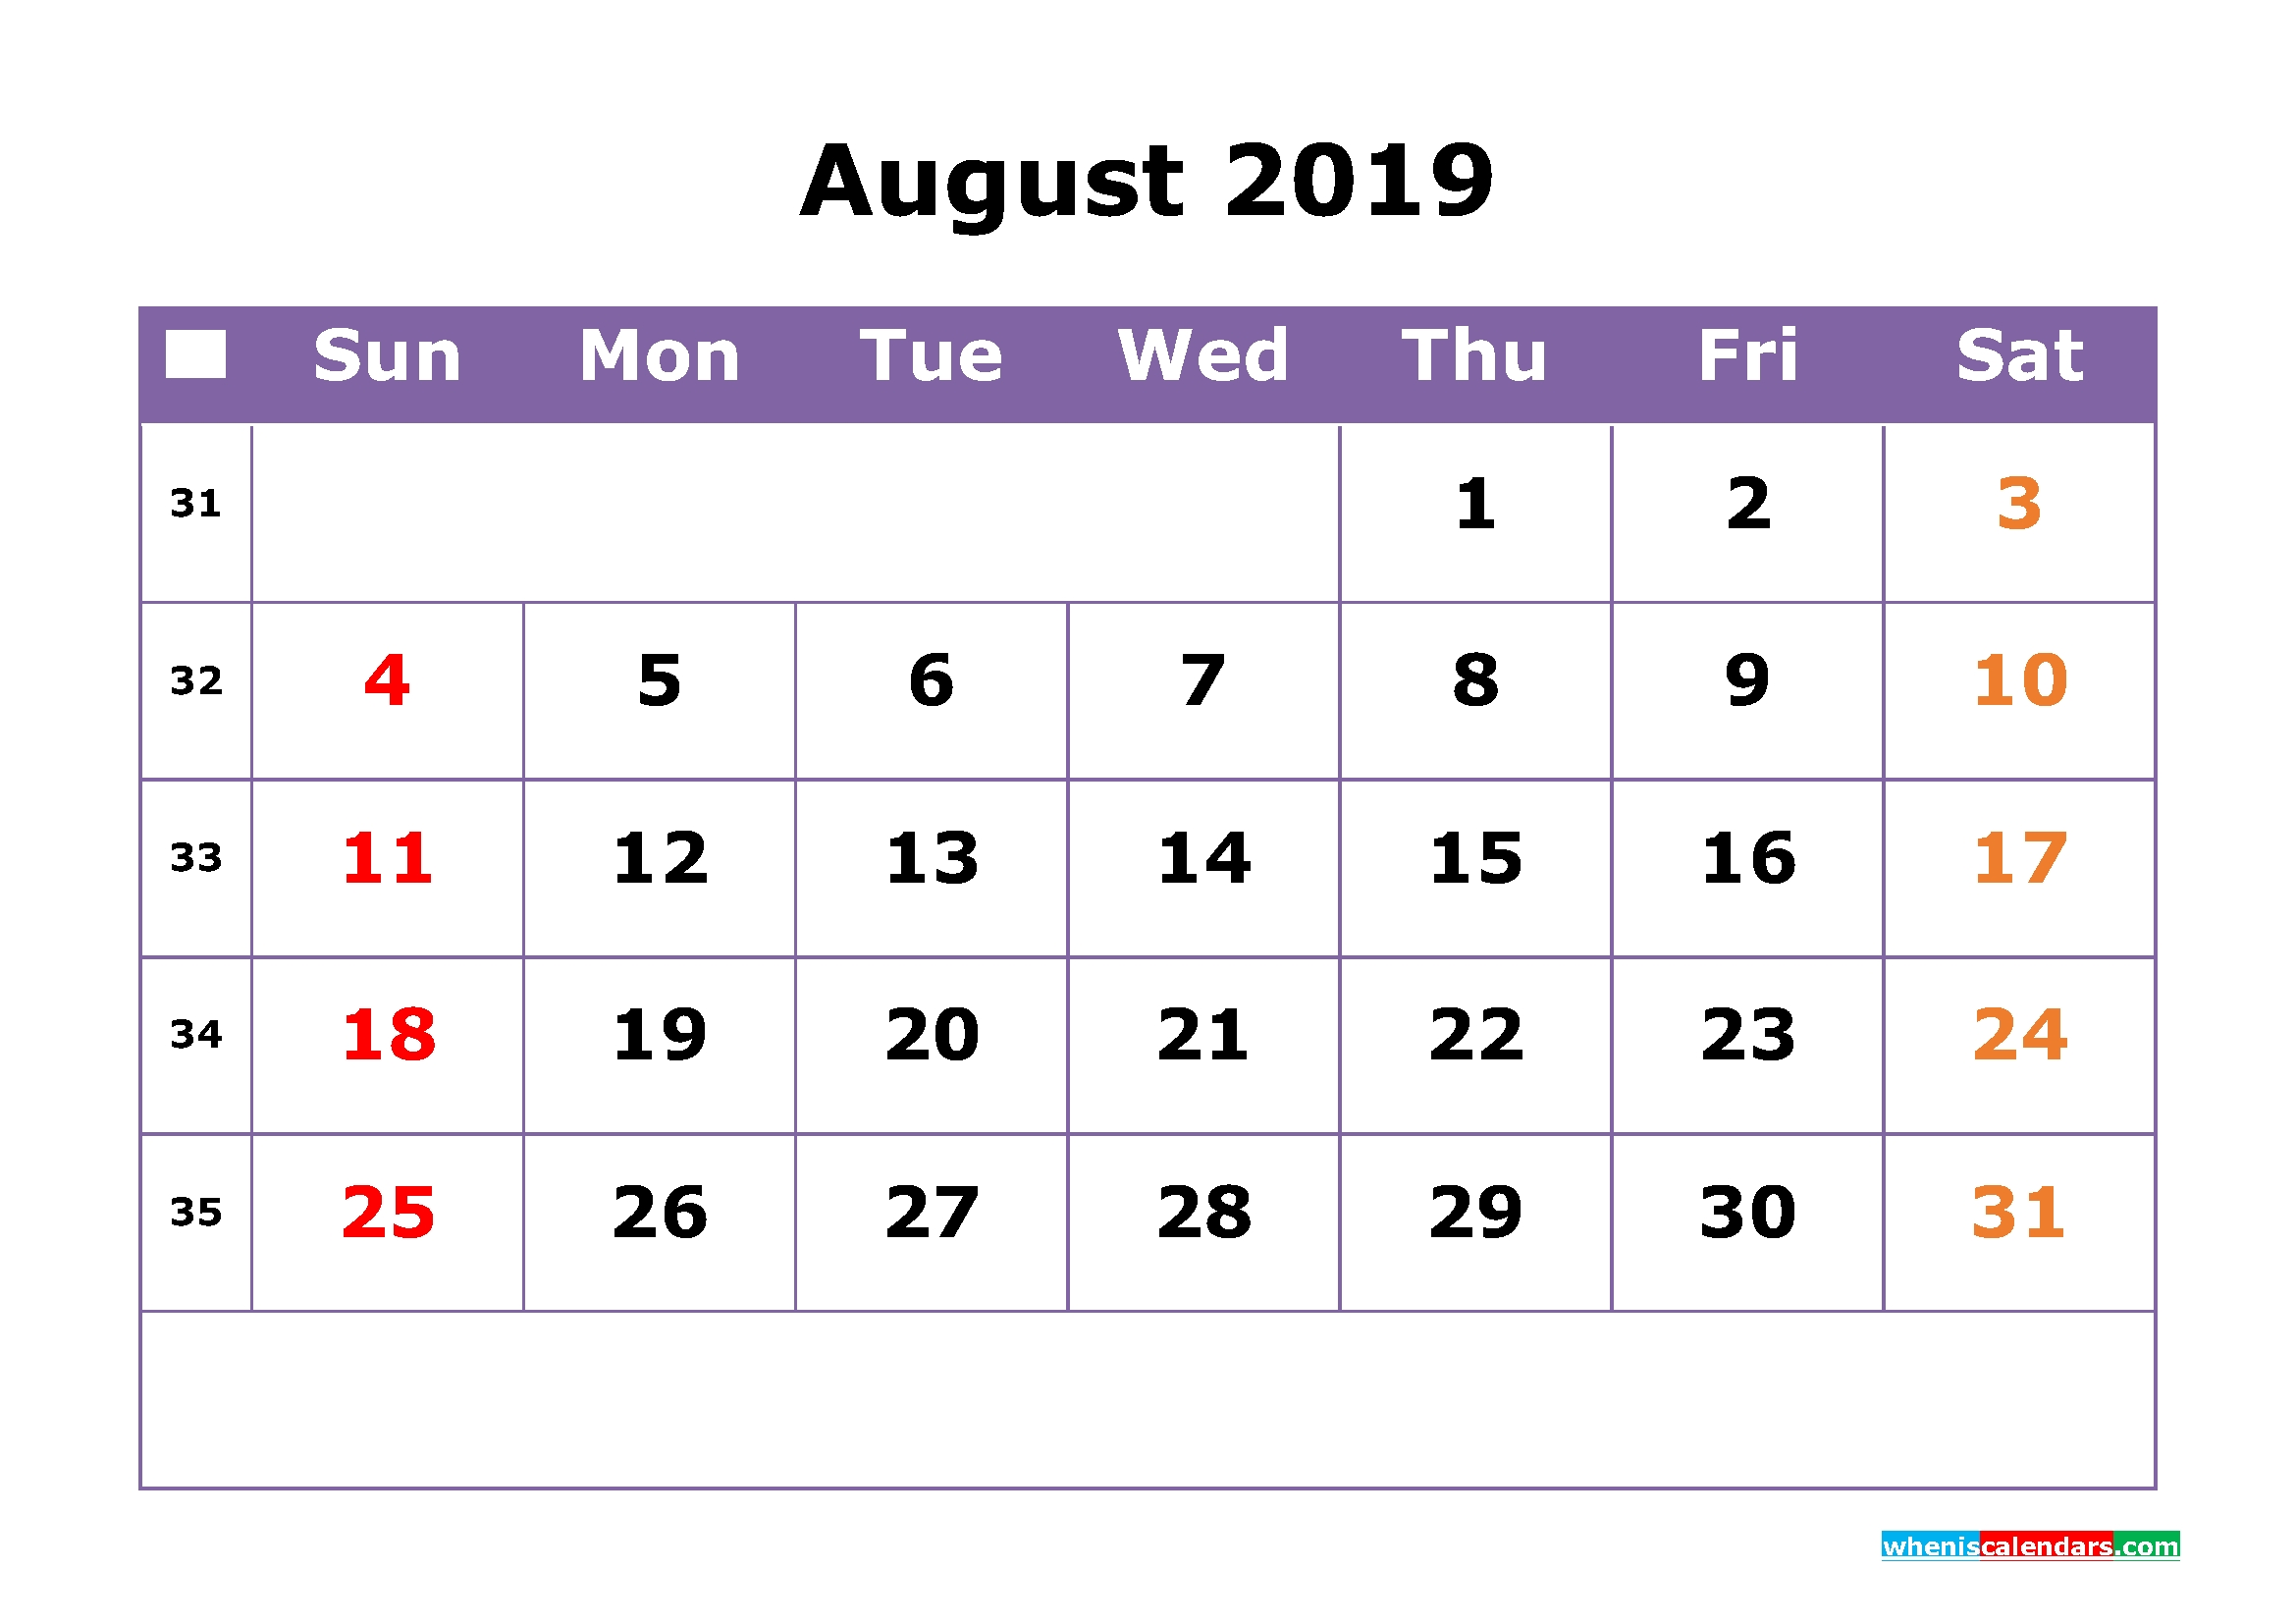 August 2019 Printable Calendar With Week Numbers For Free Download regarding Numbers Free Printable Calendar For August